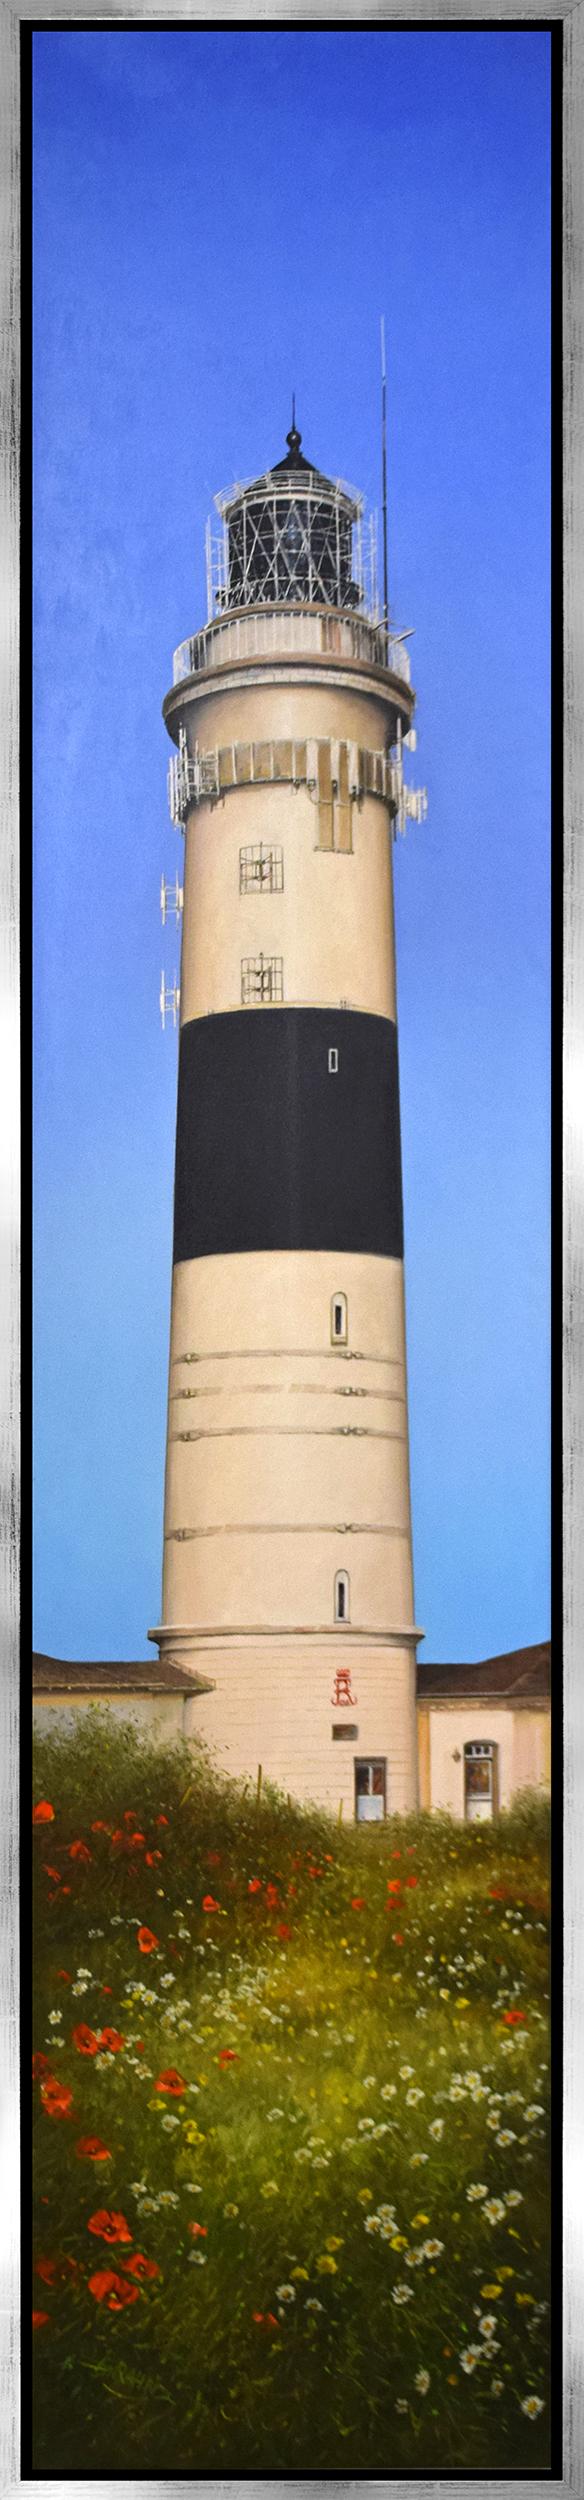 Detlef Rahn - Leuchtturm Kampen, Sylt , 7838-006-051